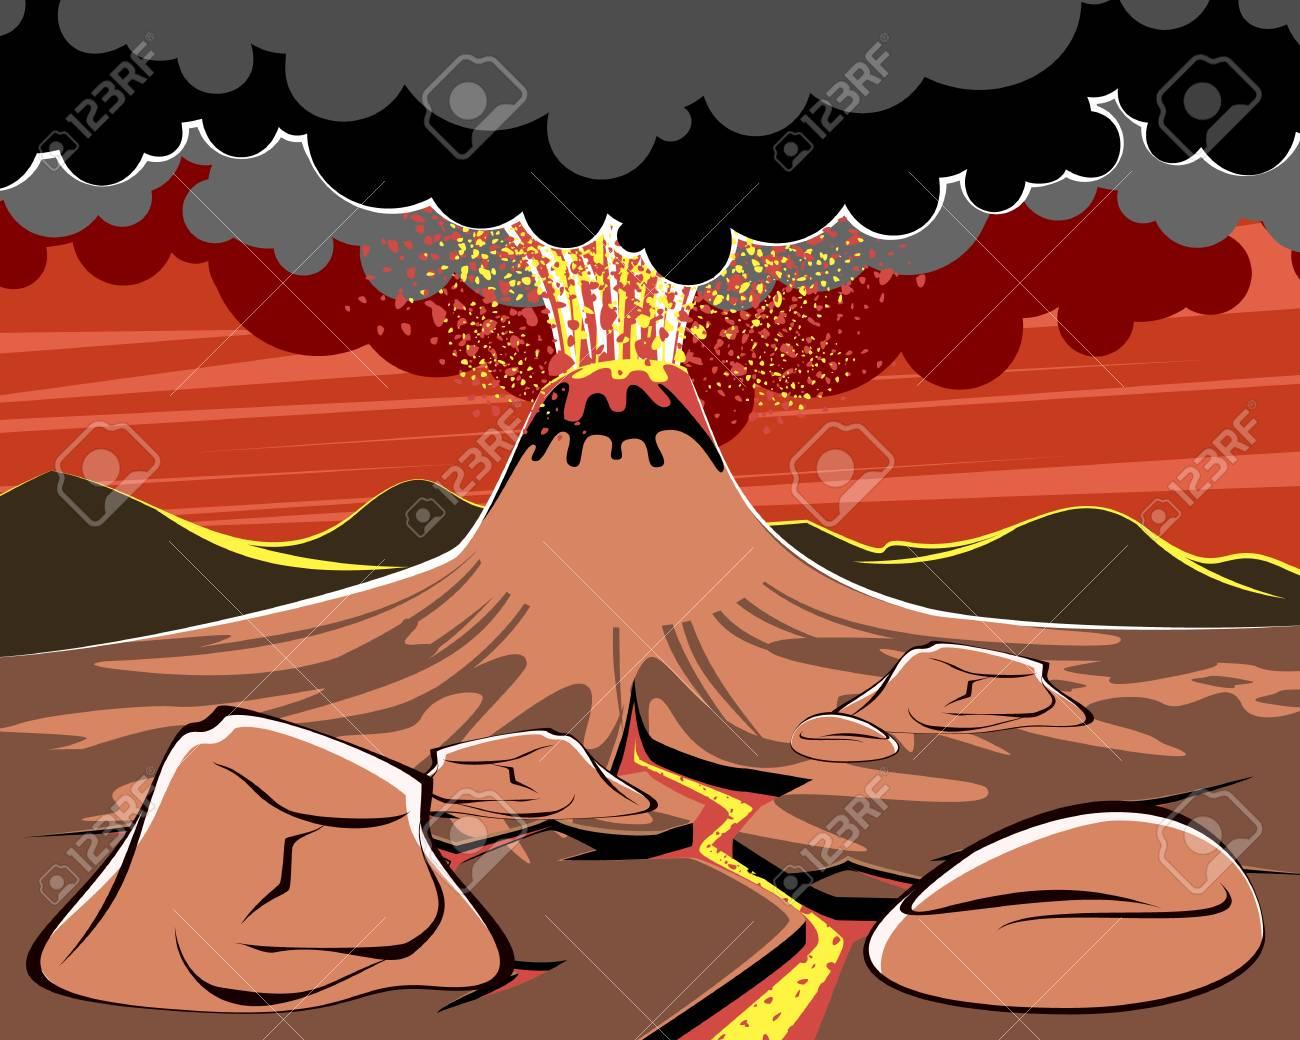 Volcano Eruption Illustration - Download Free Vectors, Clipart Graphics &  Vector Art